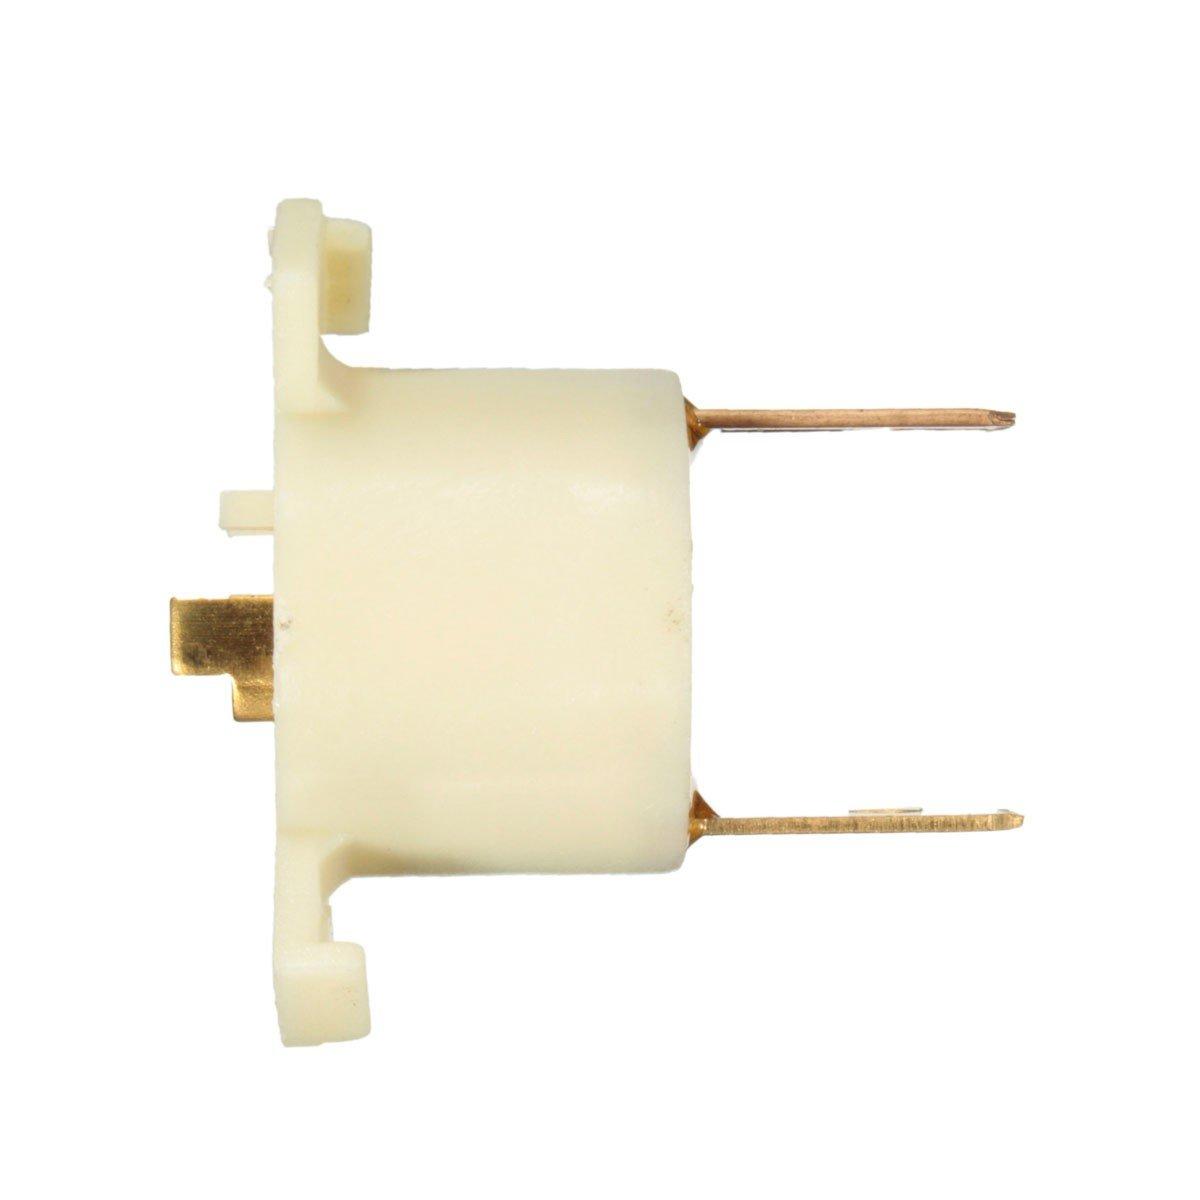 Amazon.com: Funnytoday365 H1 Halogen Headlight Bulb Socket Holder For Honda/ Crv/Cr-V/Prelude/Acura Front: Car Electronics